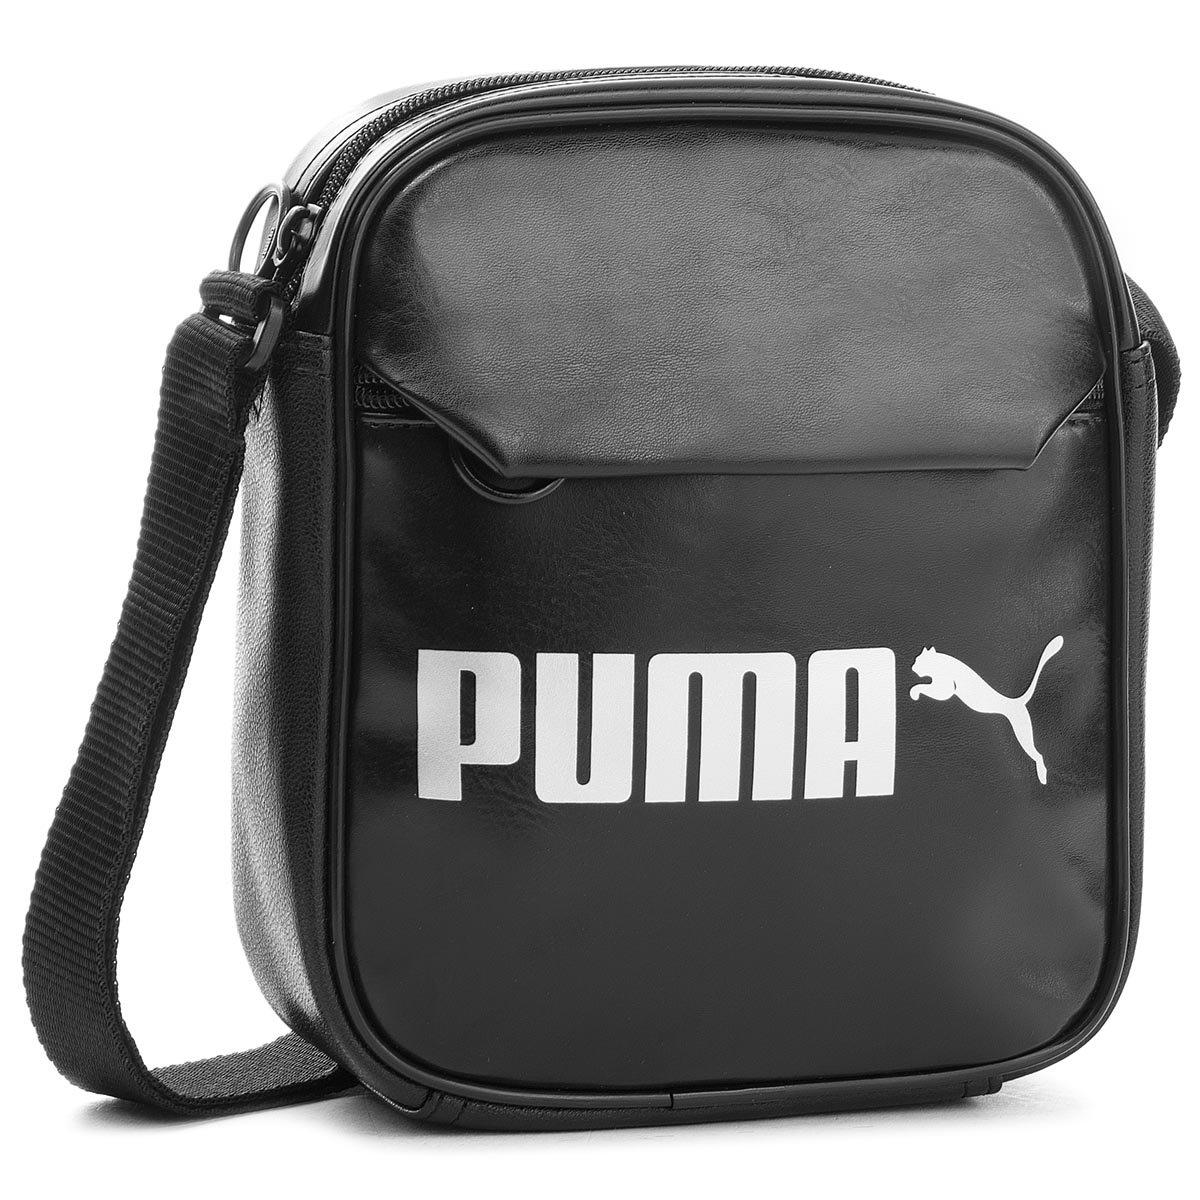 c65f5d0bee07a Torebka Puma 07500401 Campus Portable PU Czarny Torby - Torby damskie -  https://ccc.eu